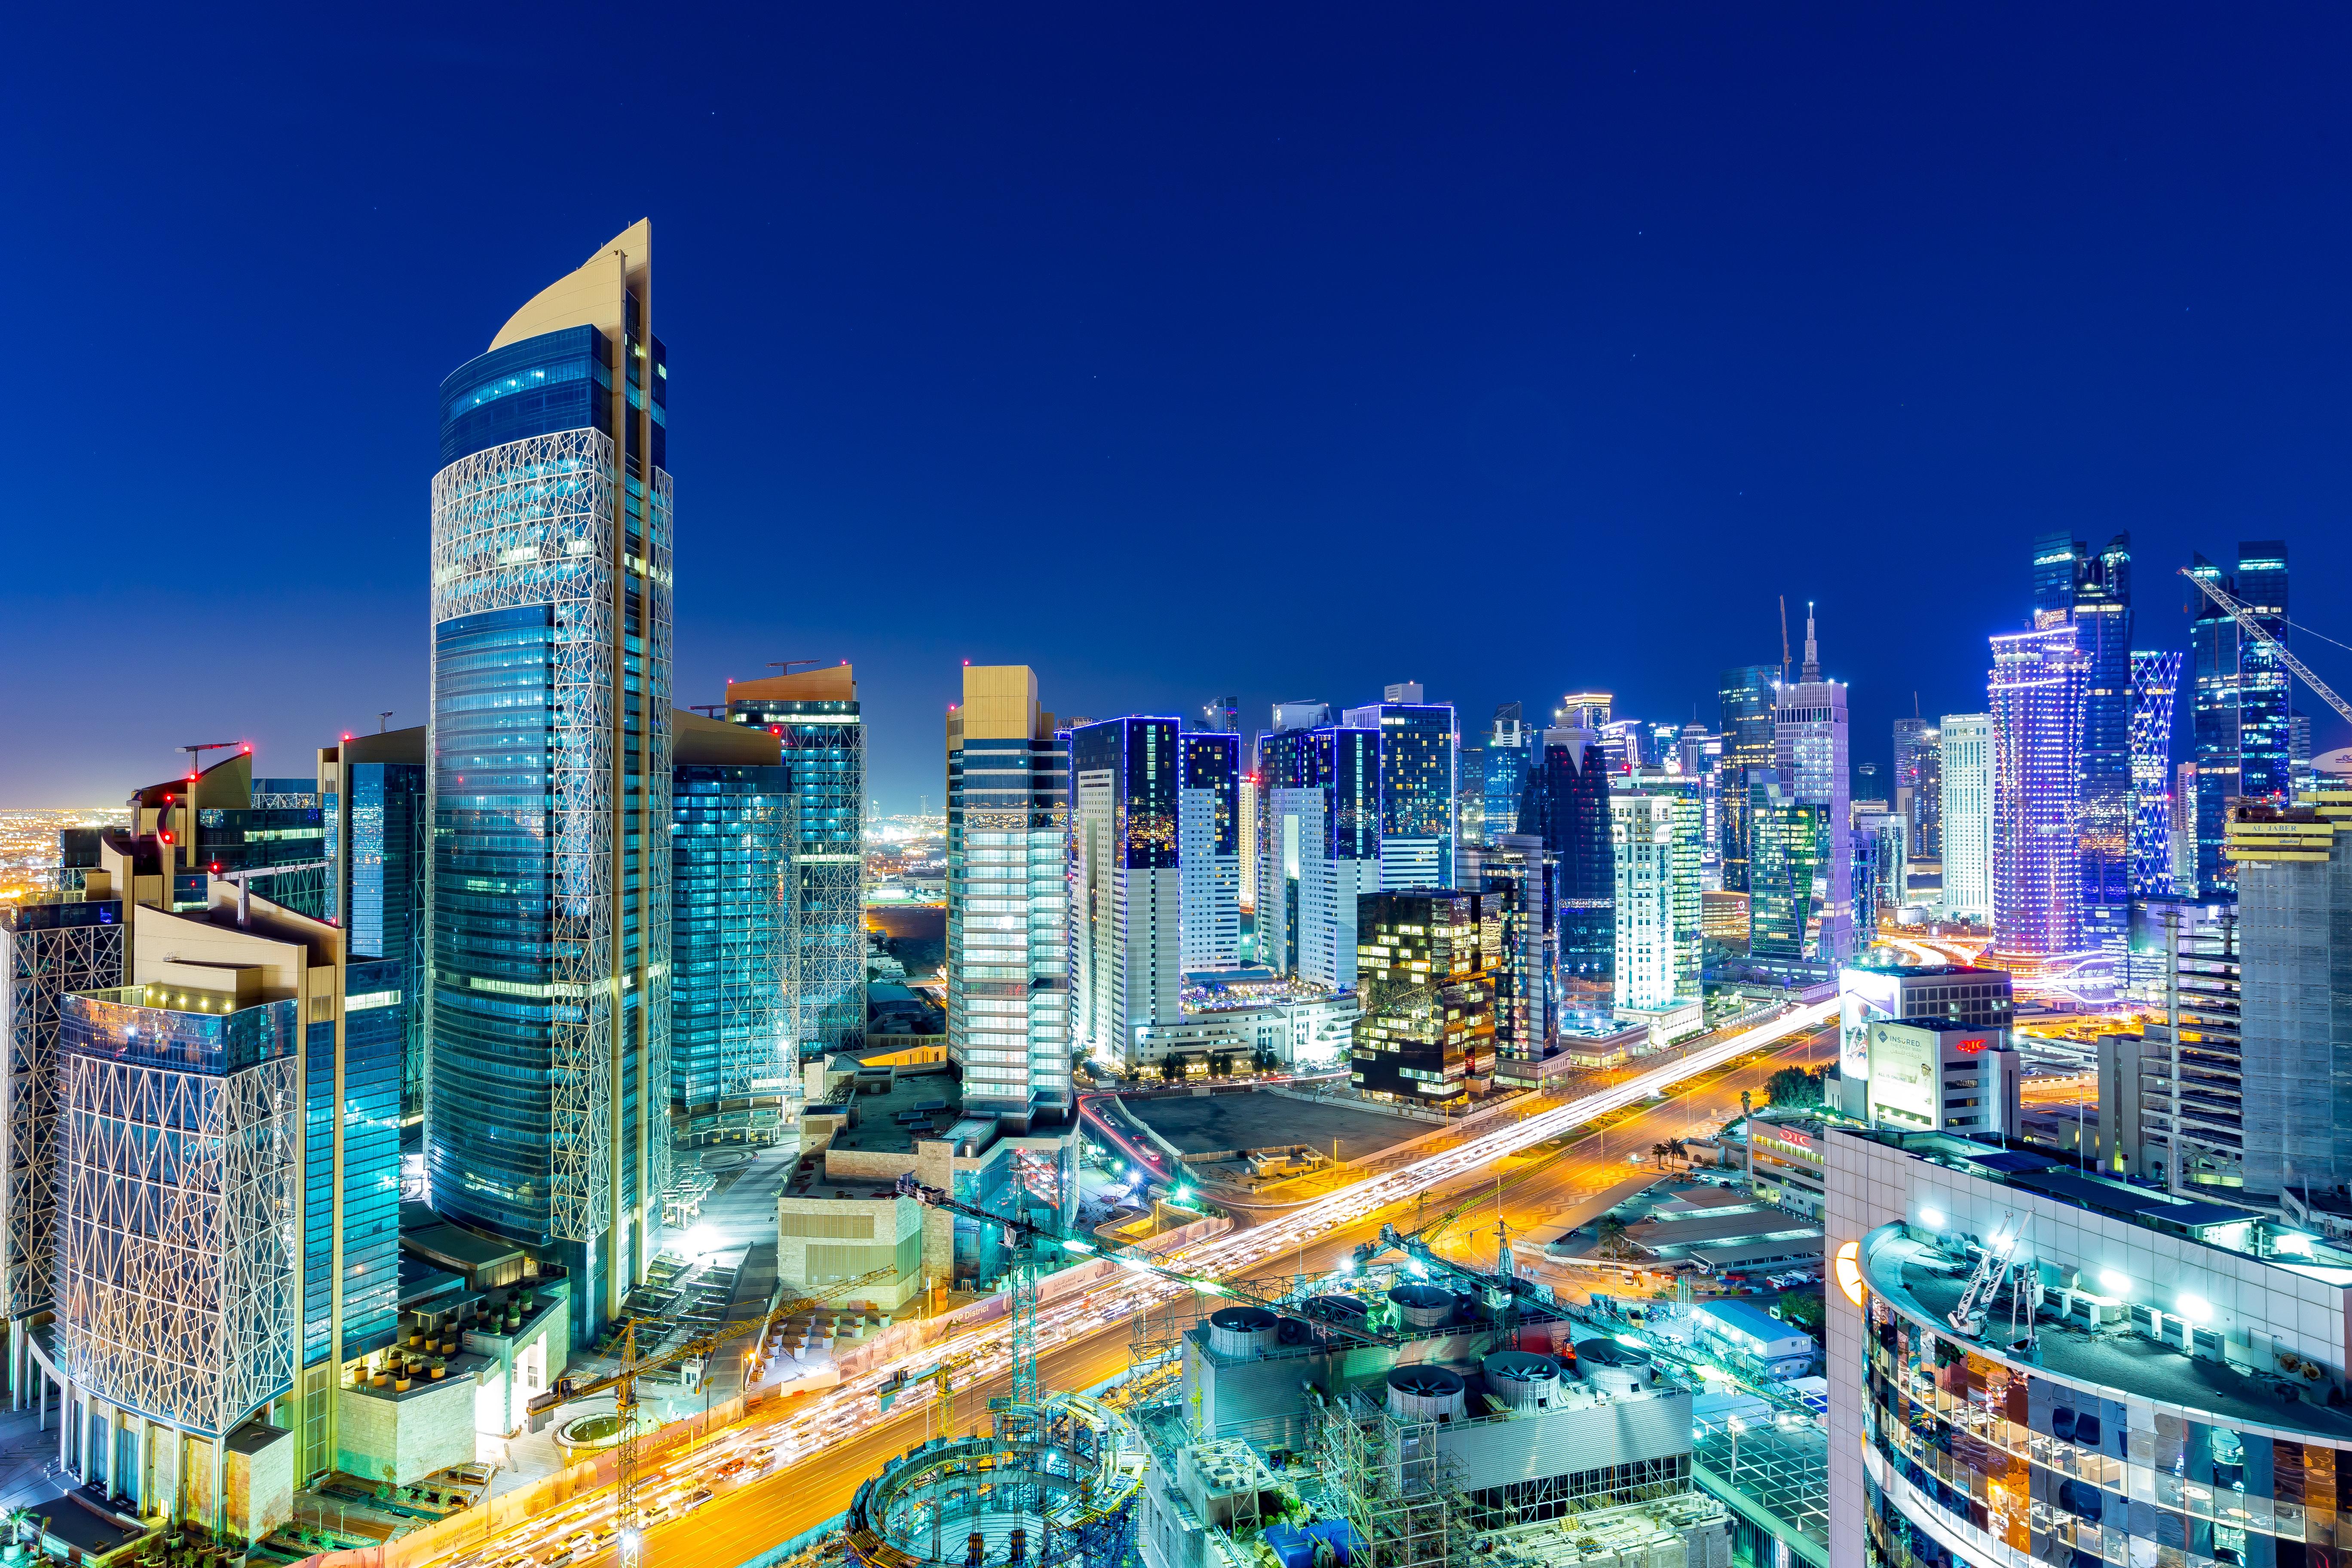 Tips on Doha Warnings or Dangers - Stay Safe! | SmarterTravel